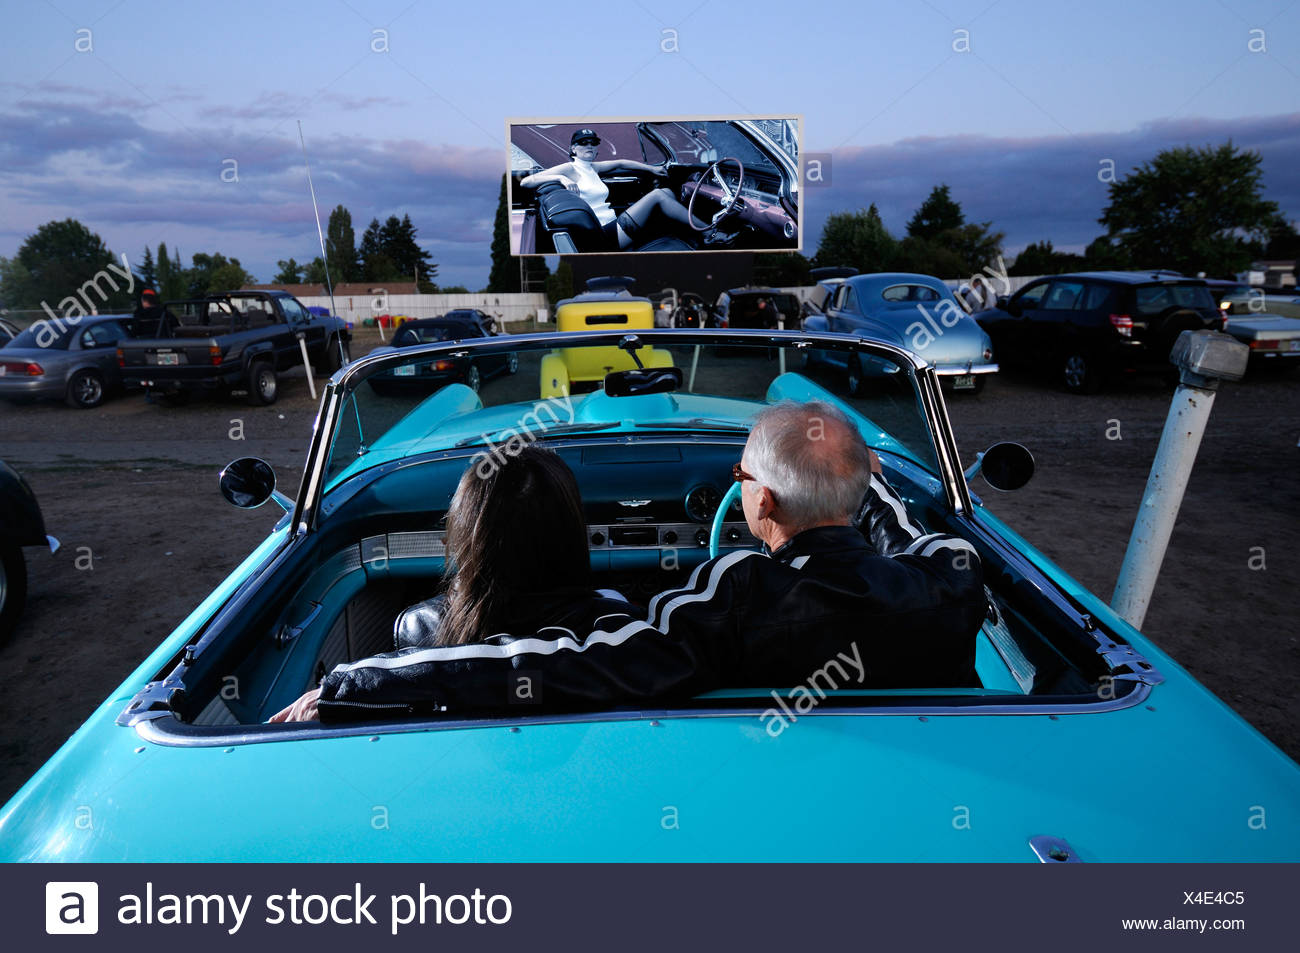 Couple cinema stock photos couple cinema stock images for Motor vu drive in dallas oregon